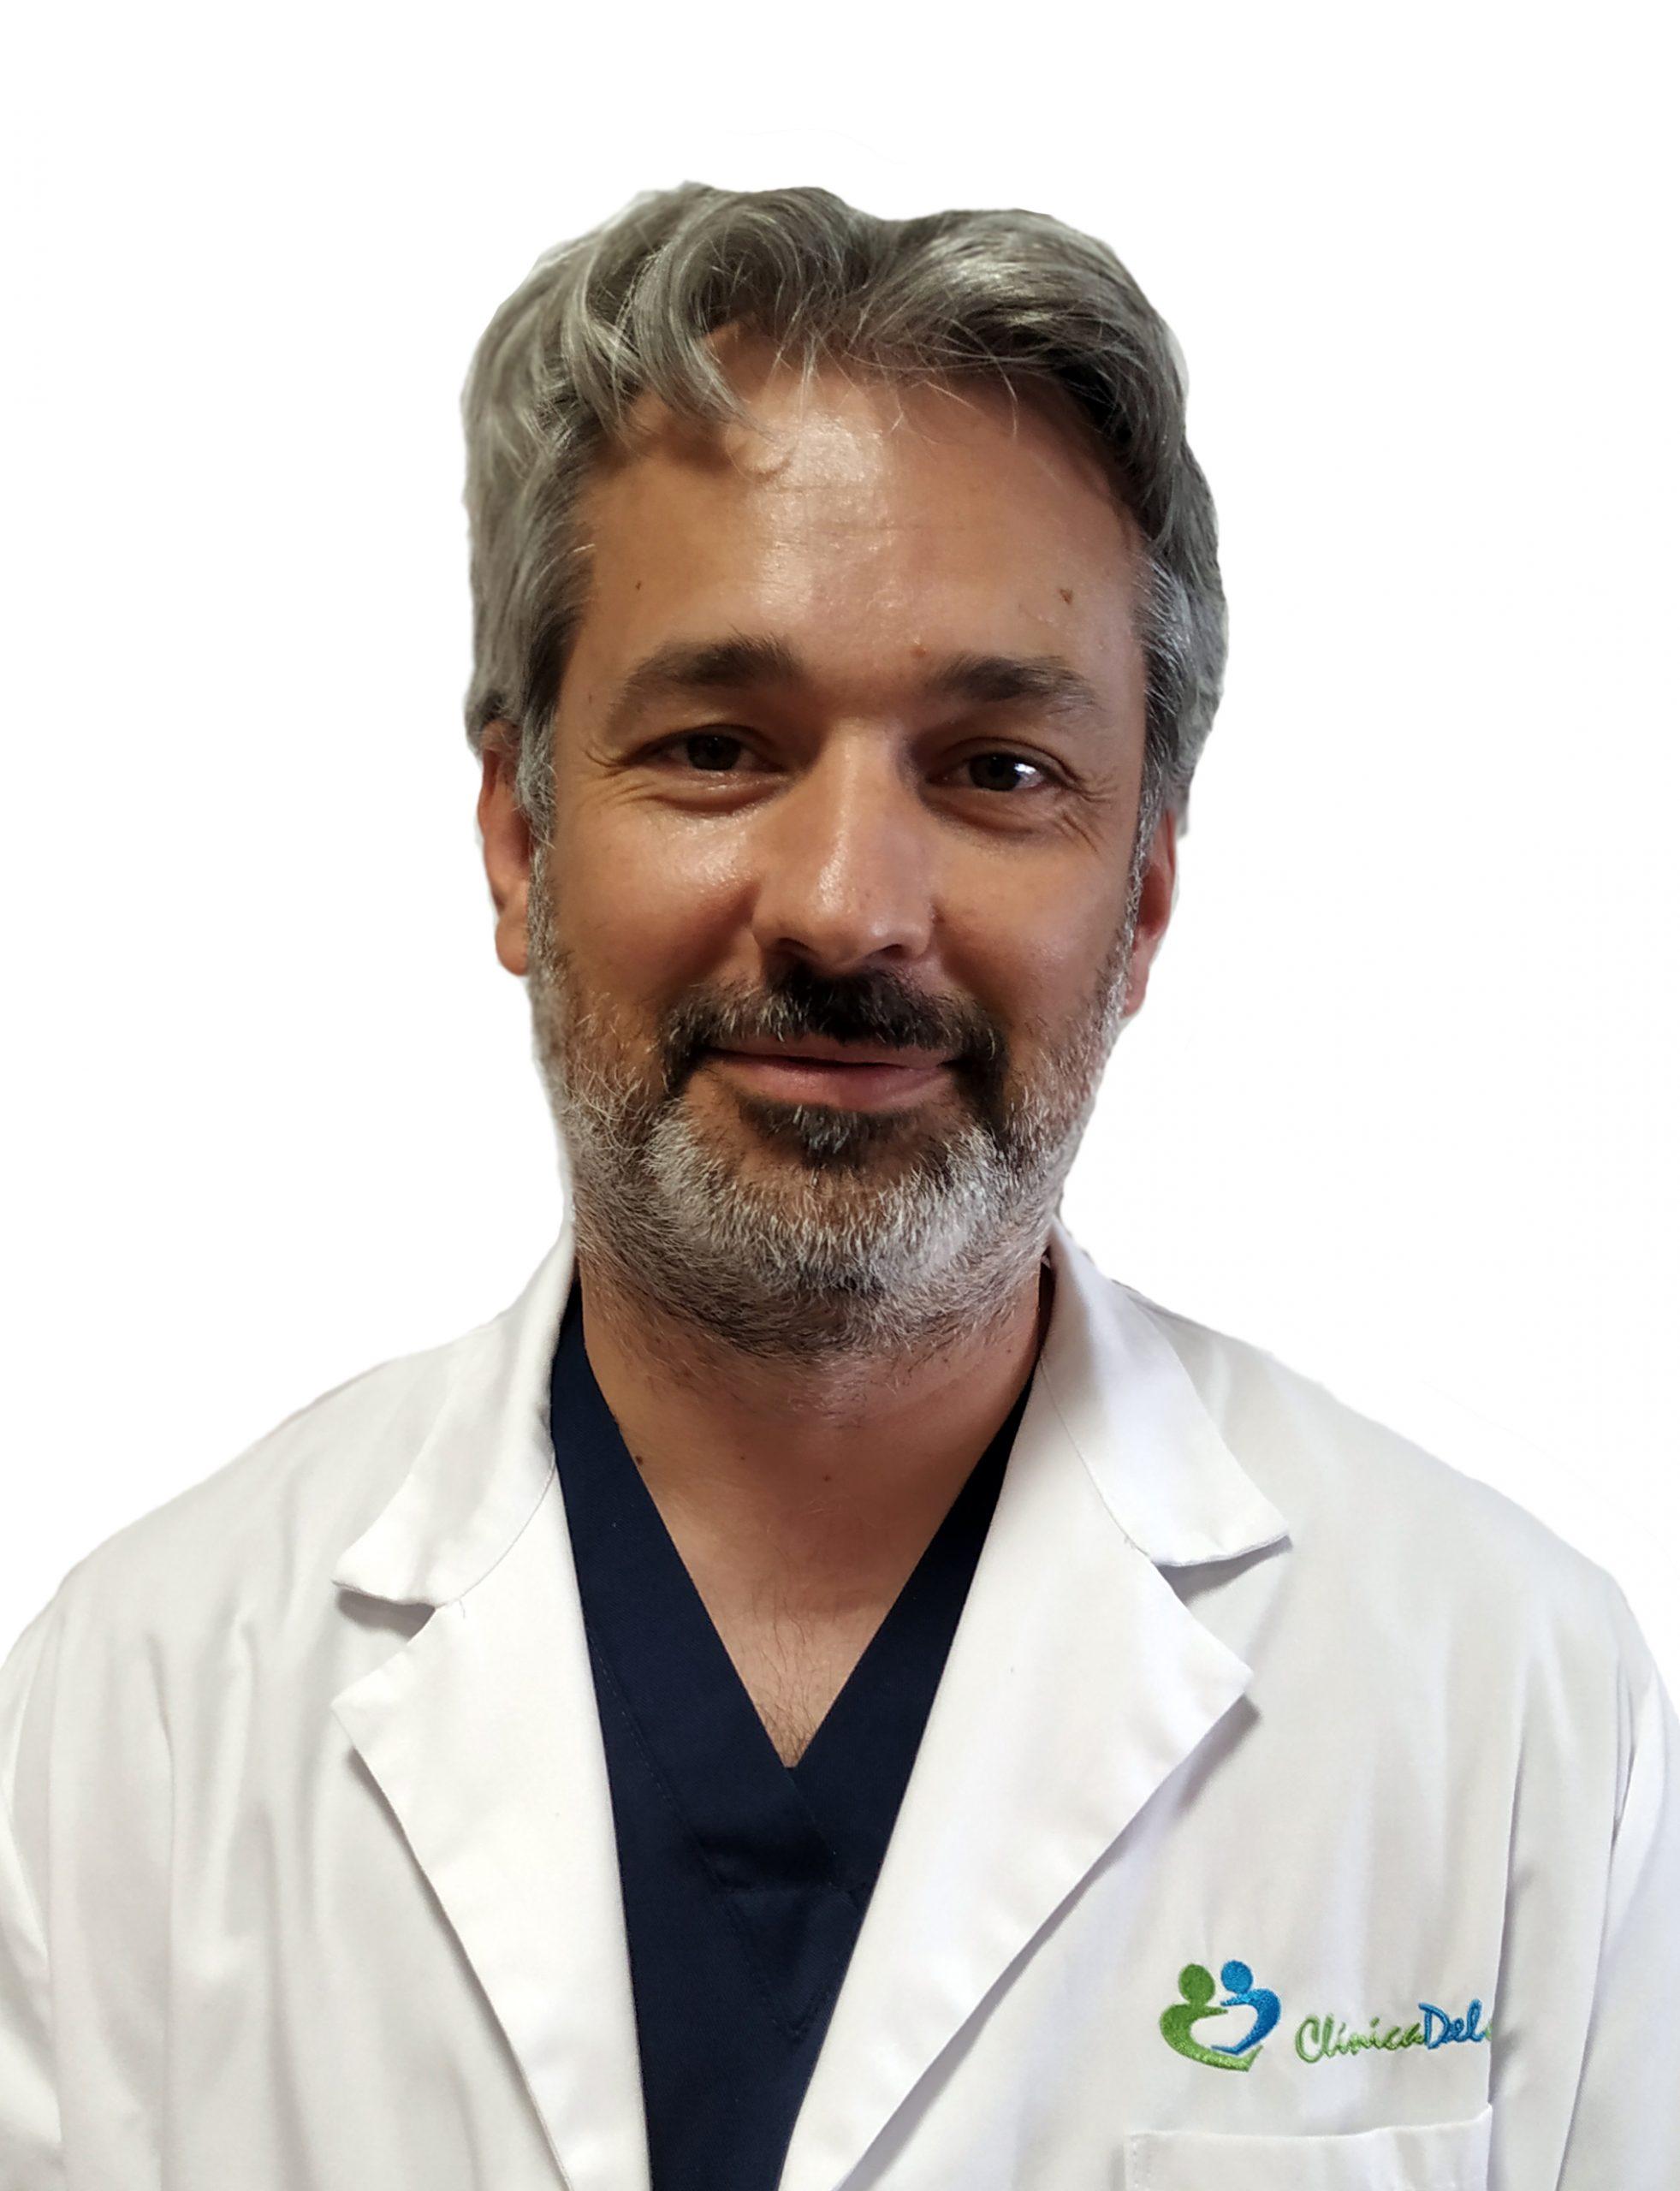 Juan Ortega Herrejón